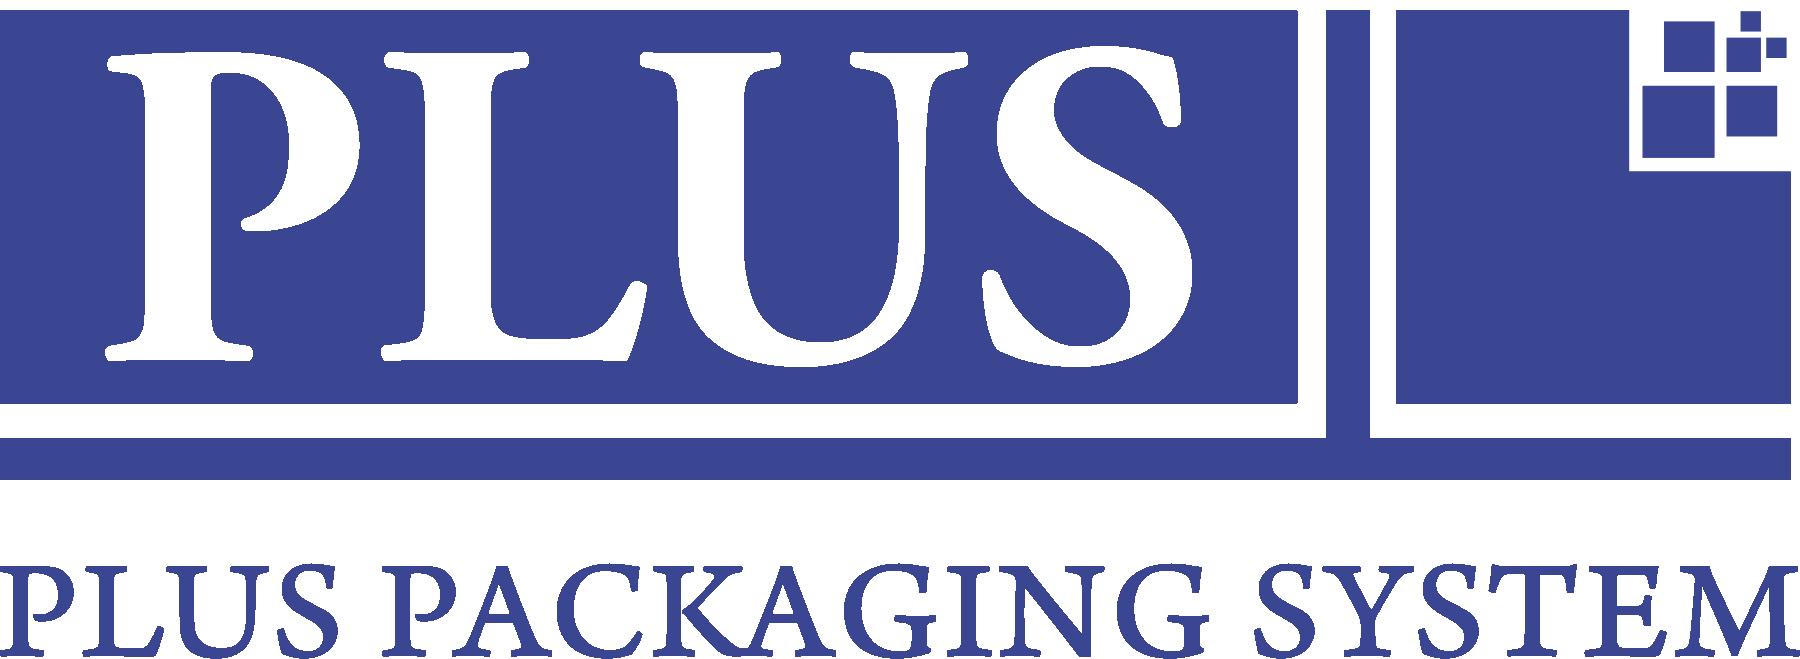 Plus Packaging System - logo